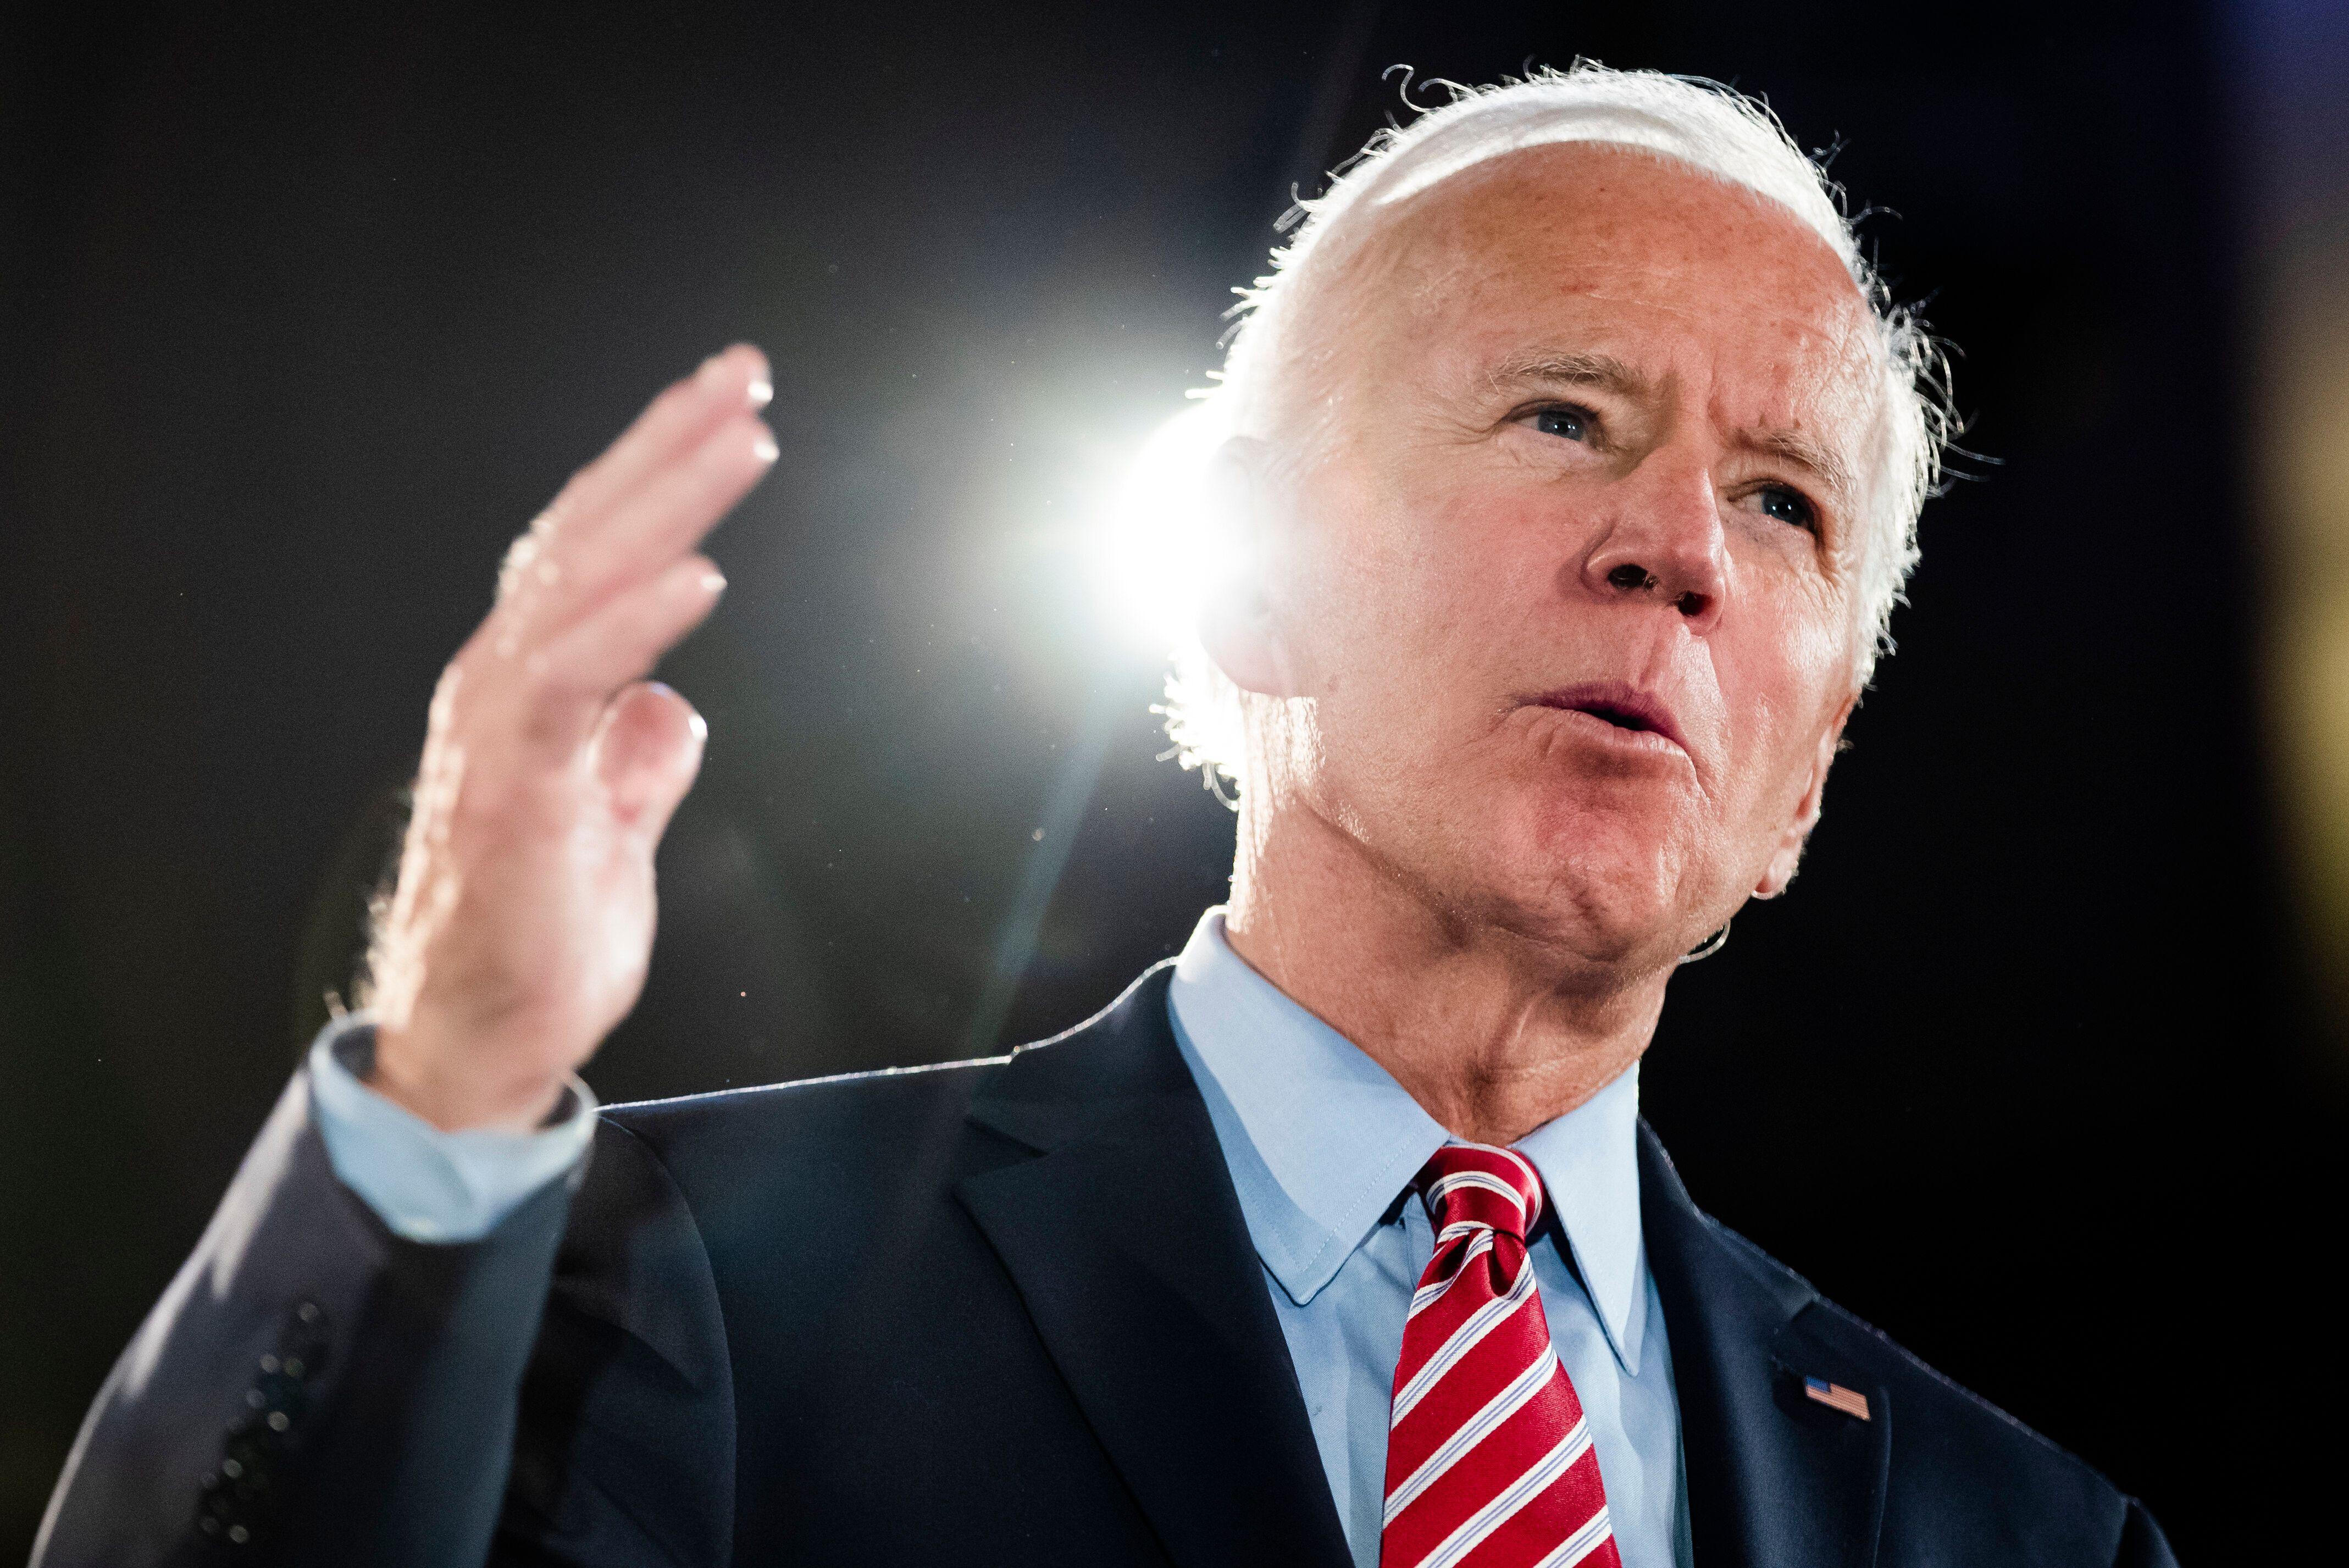 Joe Biden Tells K Street Fundraiser: GOP Will Have 'Epiphany' After Trump